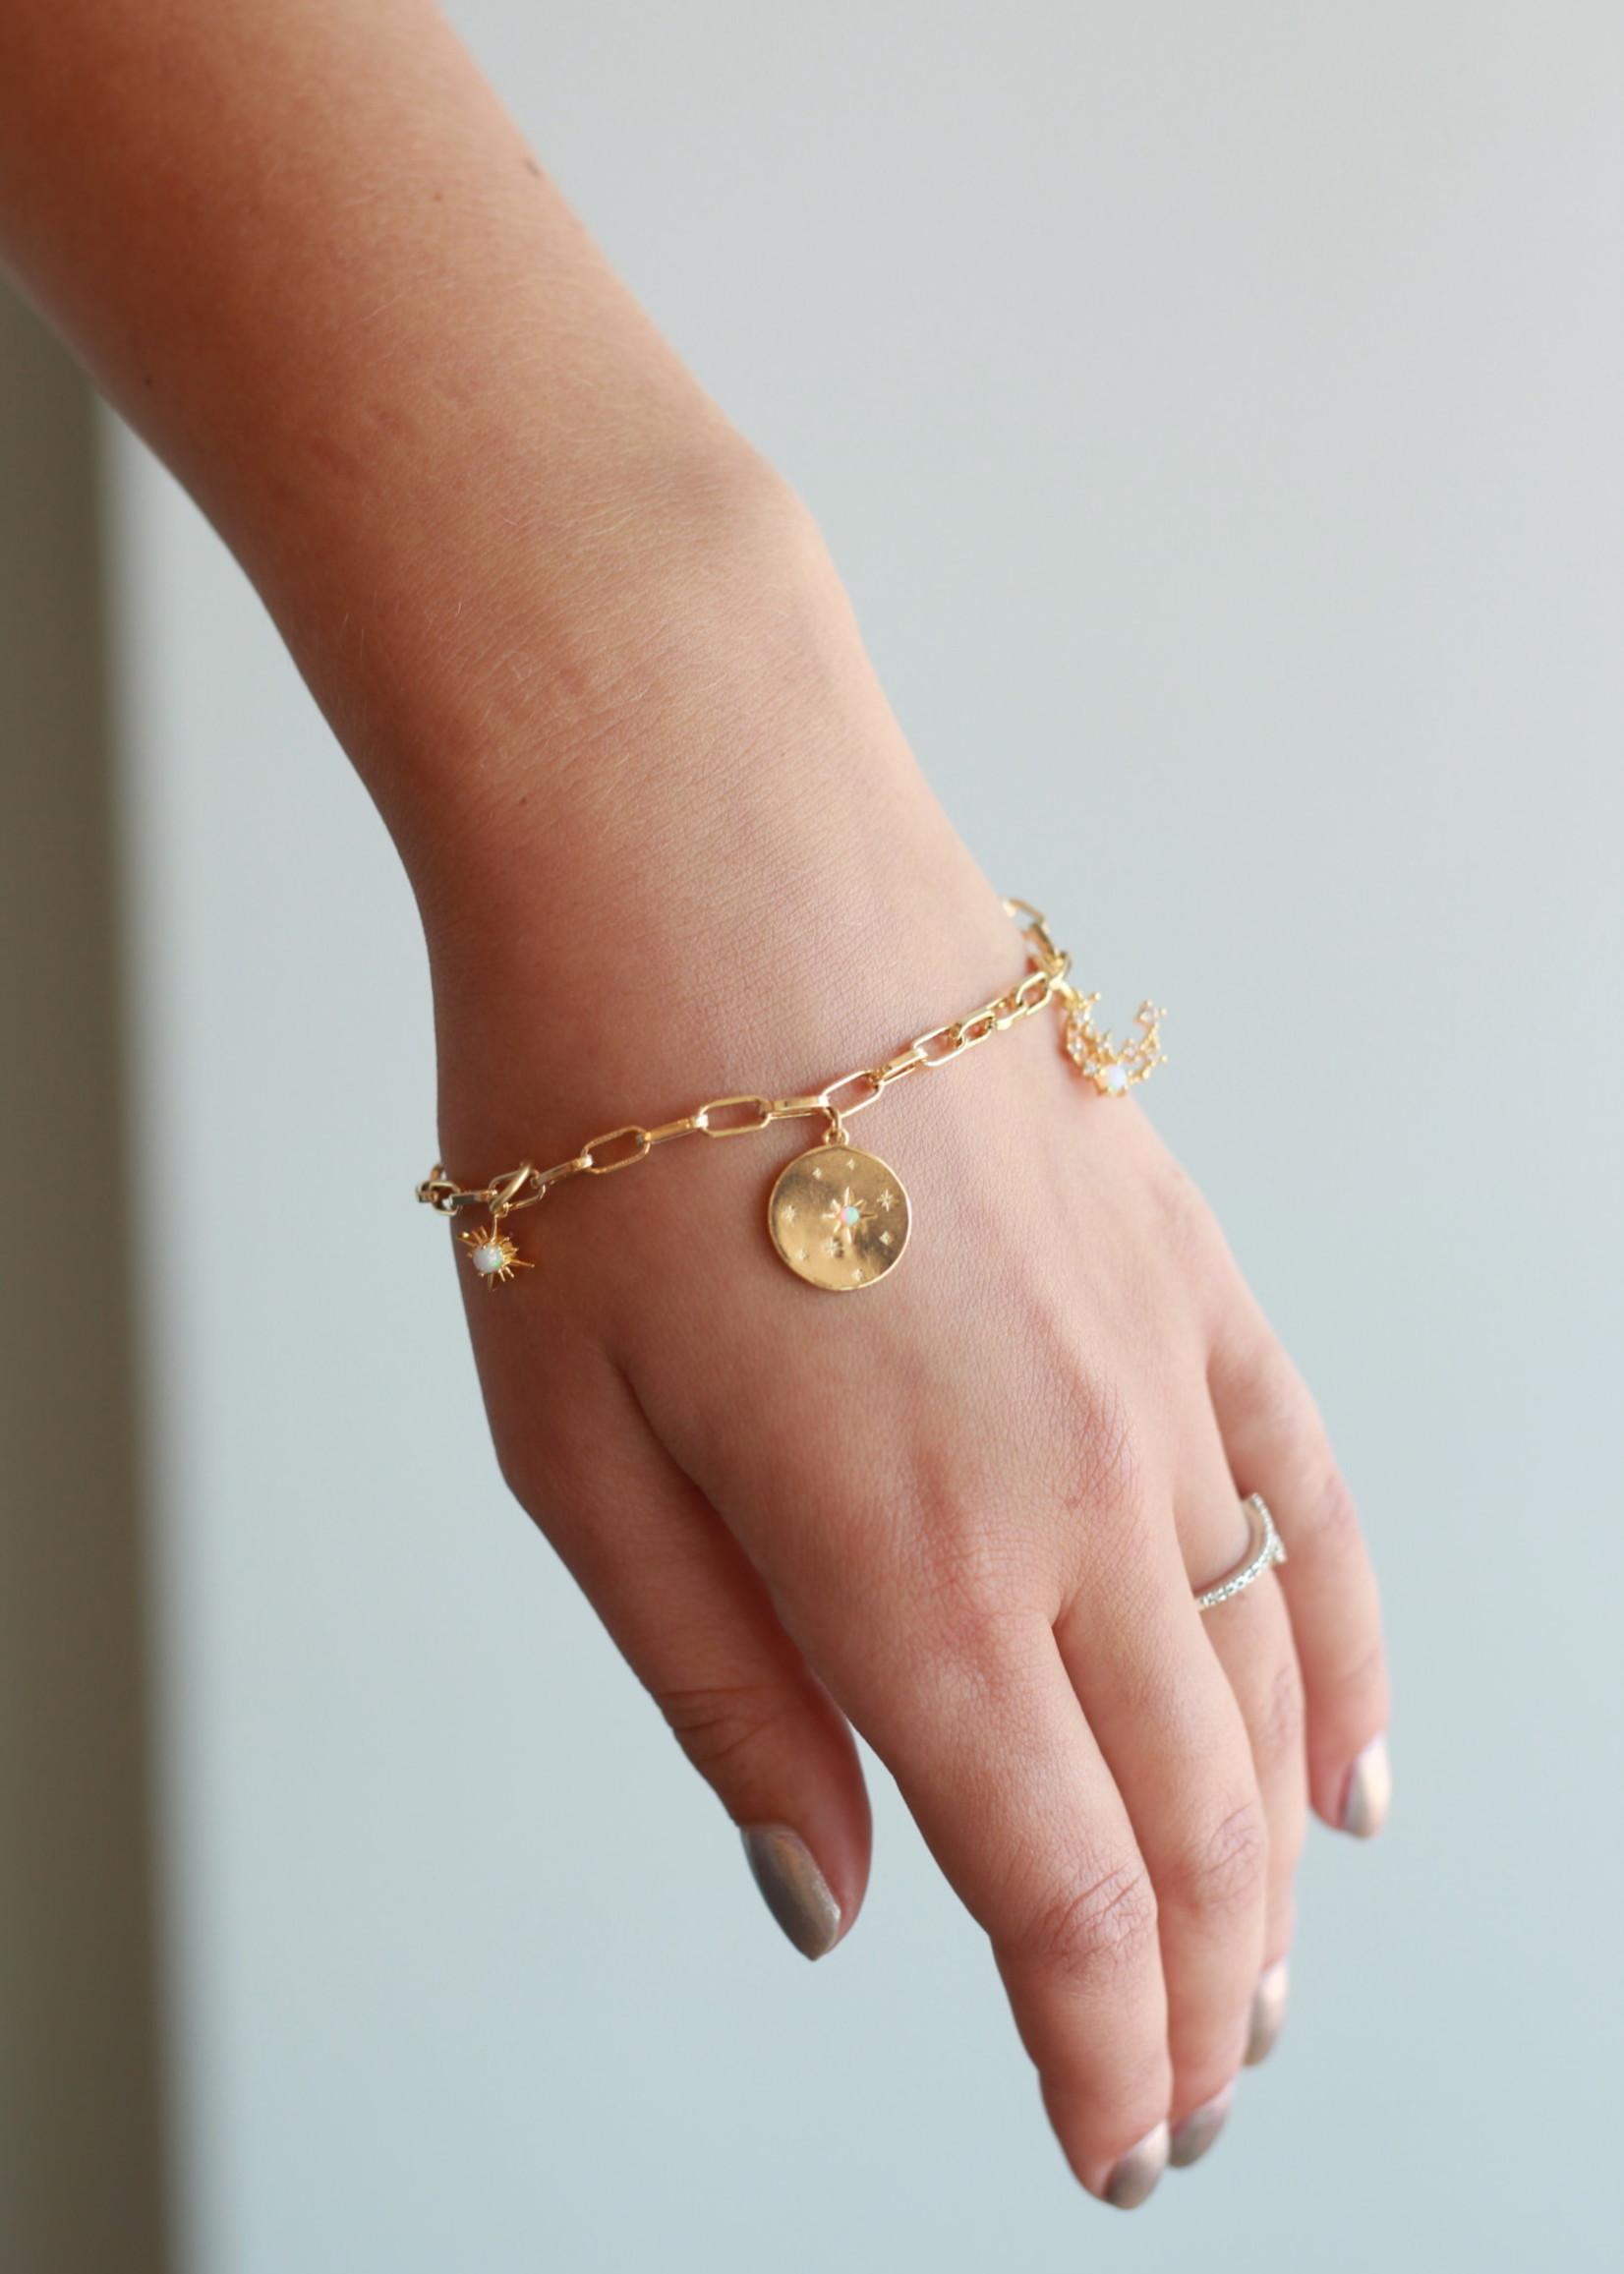 Allison Conway AC Celestial Charm Bracelet